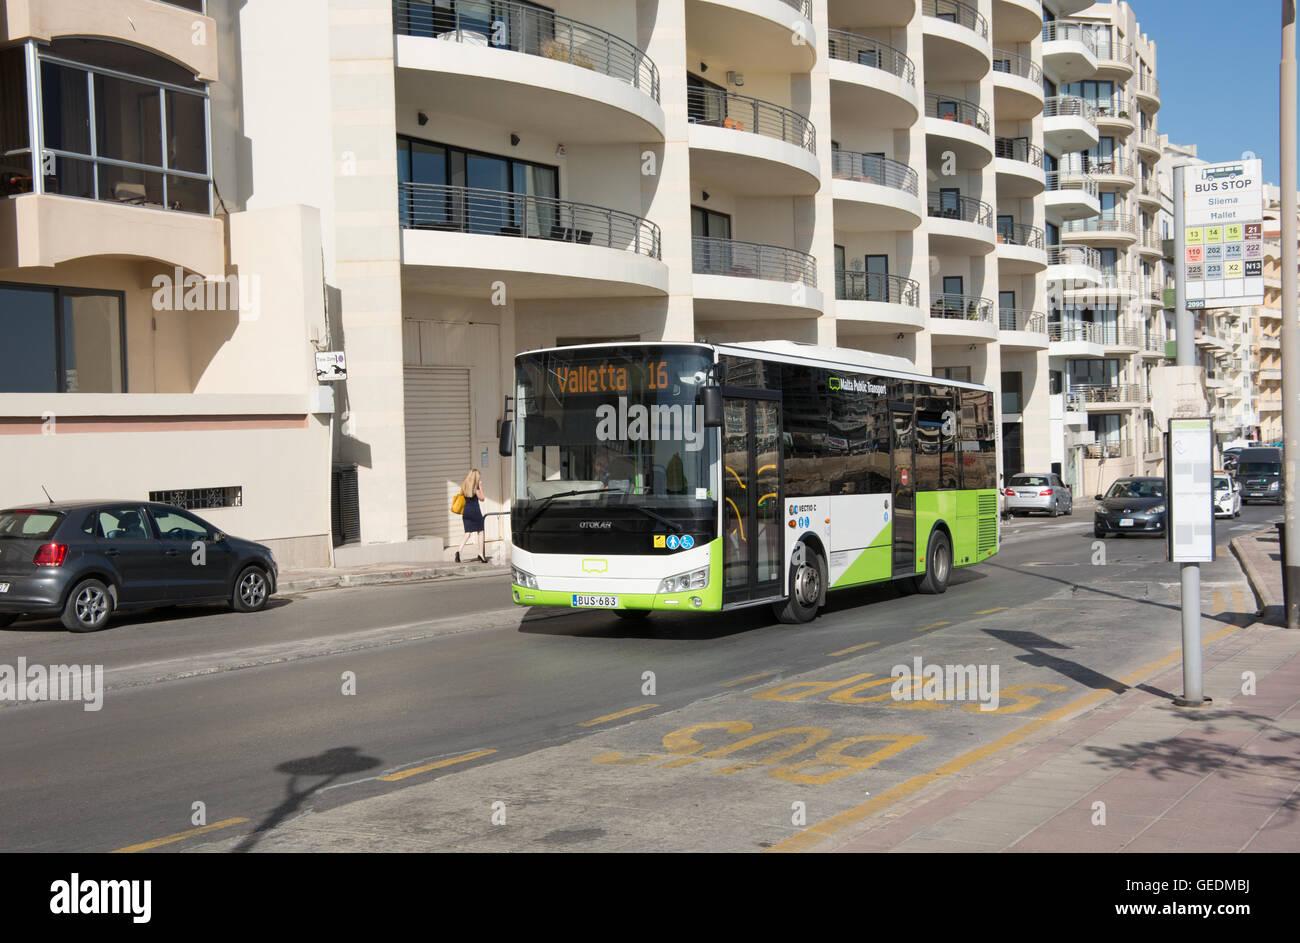 A Turkish built Otokar Vectio C bus operated by Malta Public transport passes through Sliema on route 16 to Valletta - Stock Image